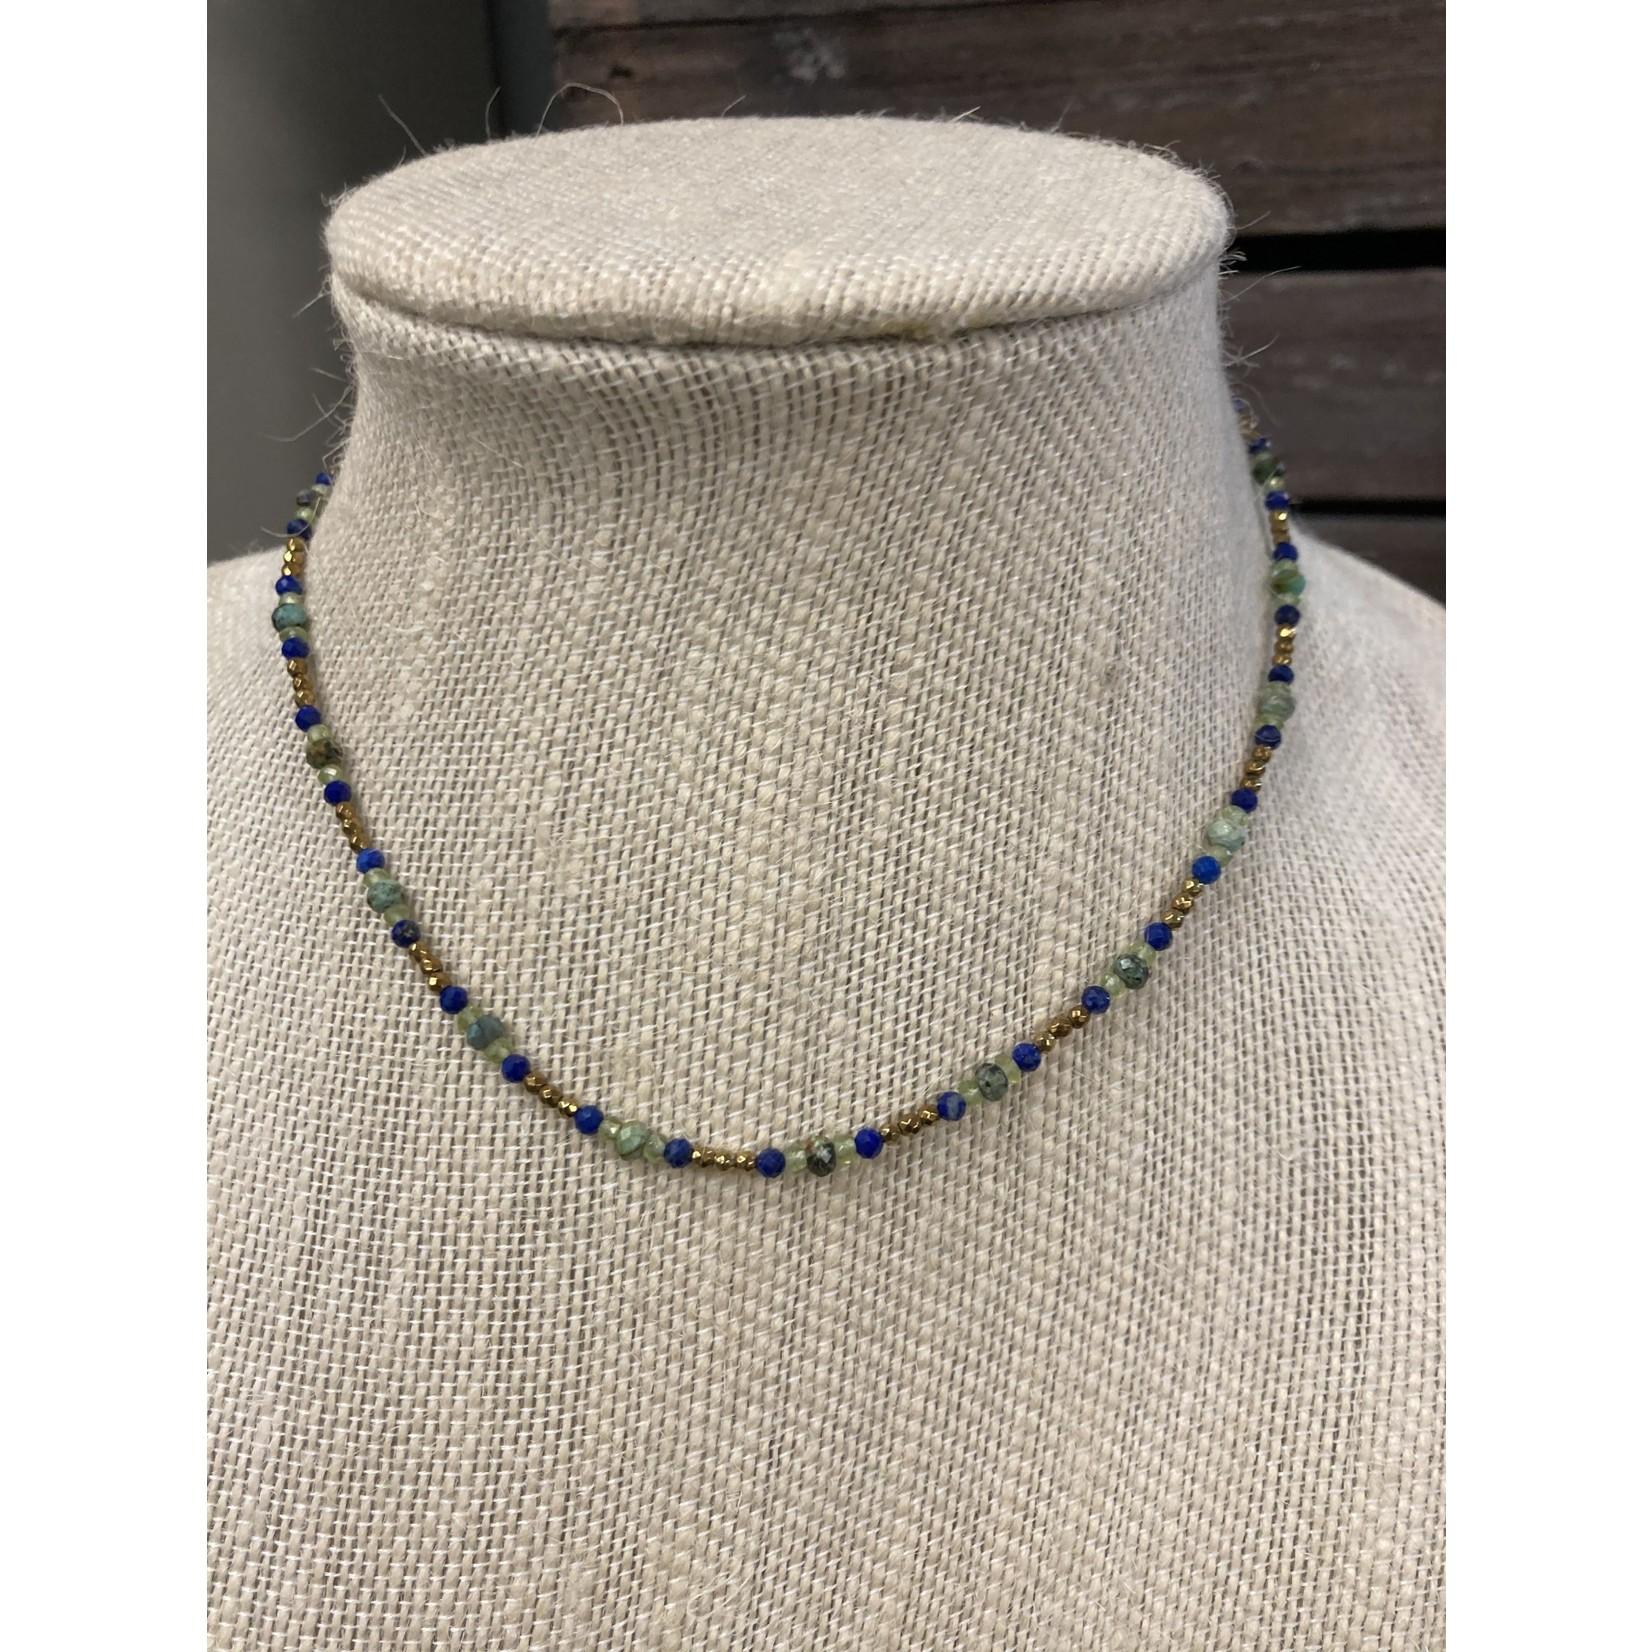 Maureen Oehrle Maureen Oehrle | N2 Pyrite with multistone repeat (African turquoise, lapis, peridot)